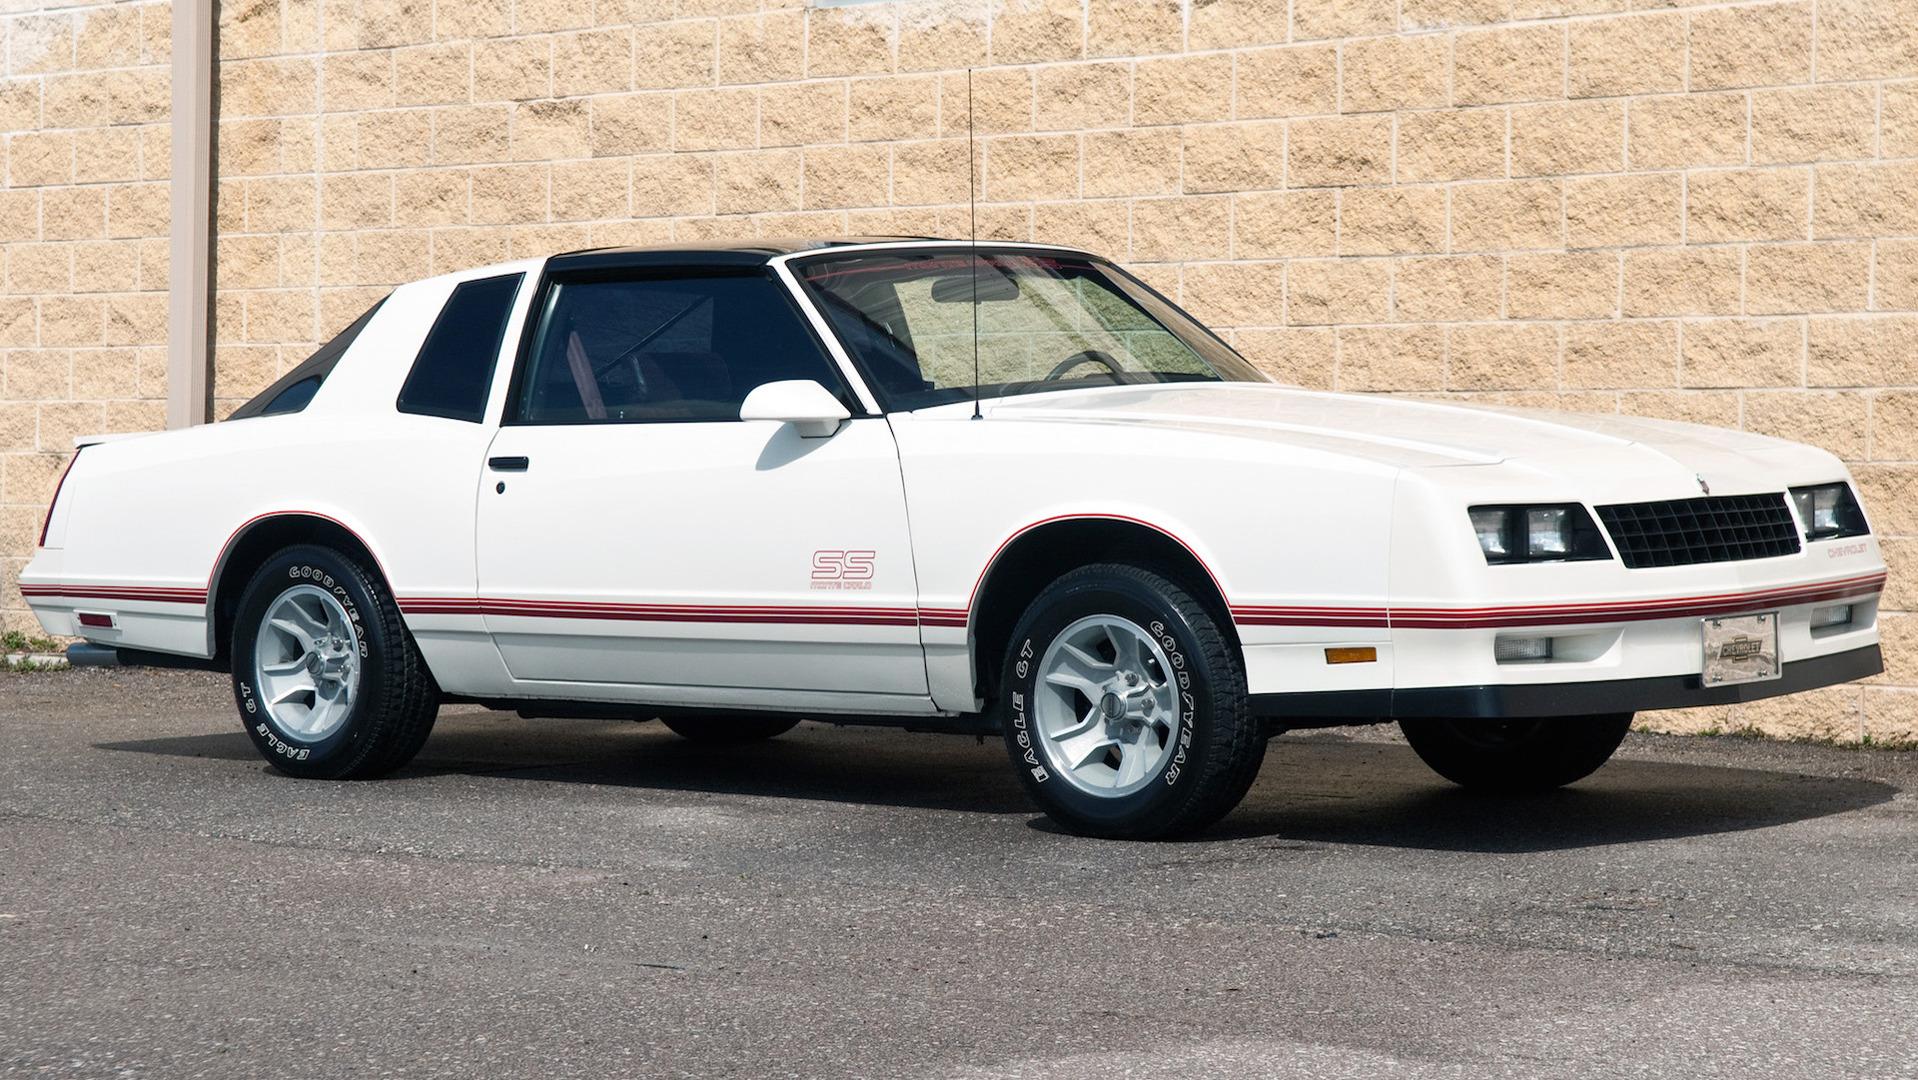 Modern Best Cars Of The 80s Vignette - Classic Cars Ideas - boiq.info